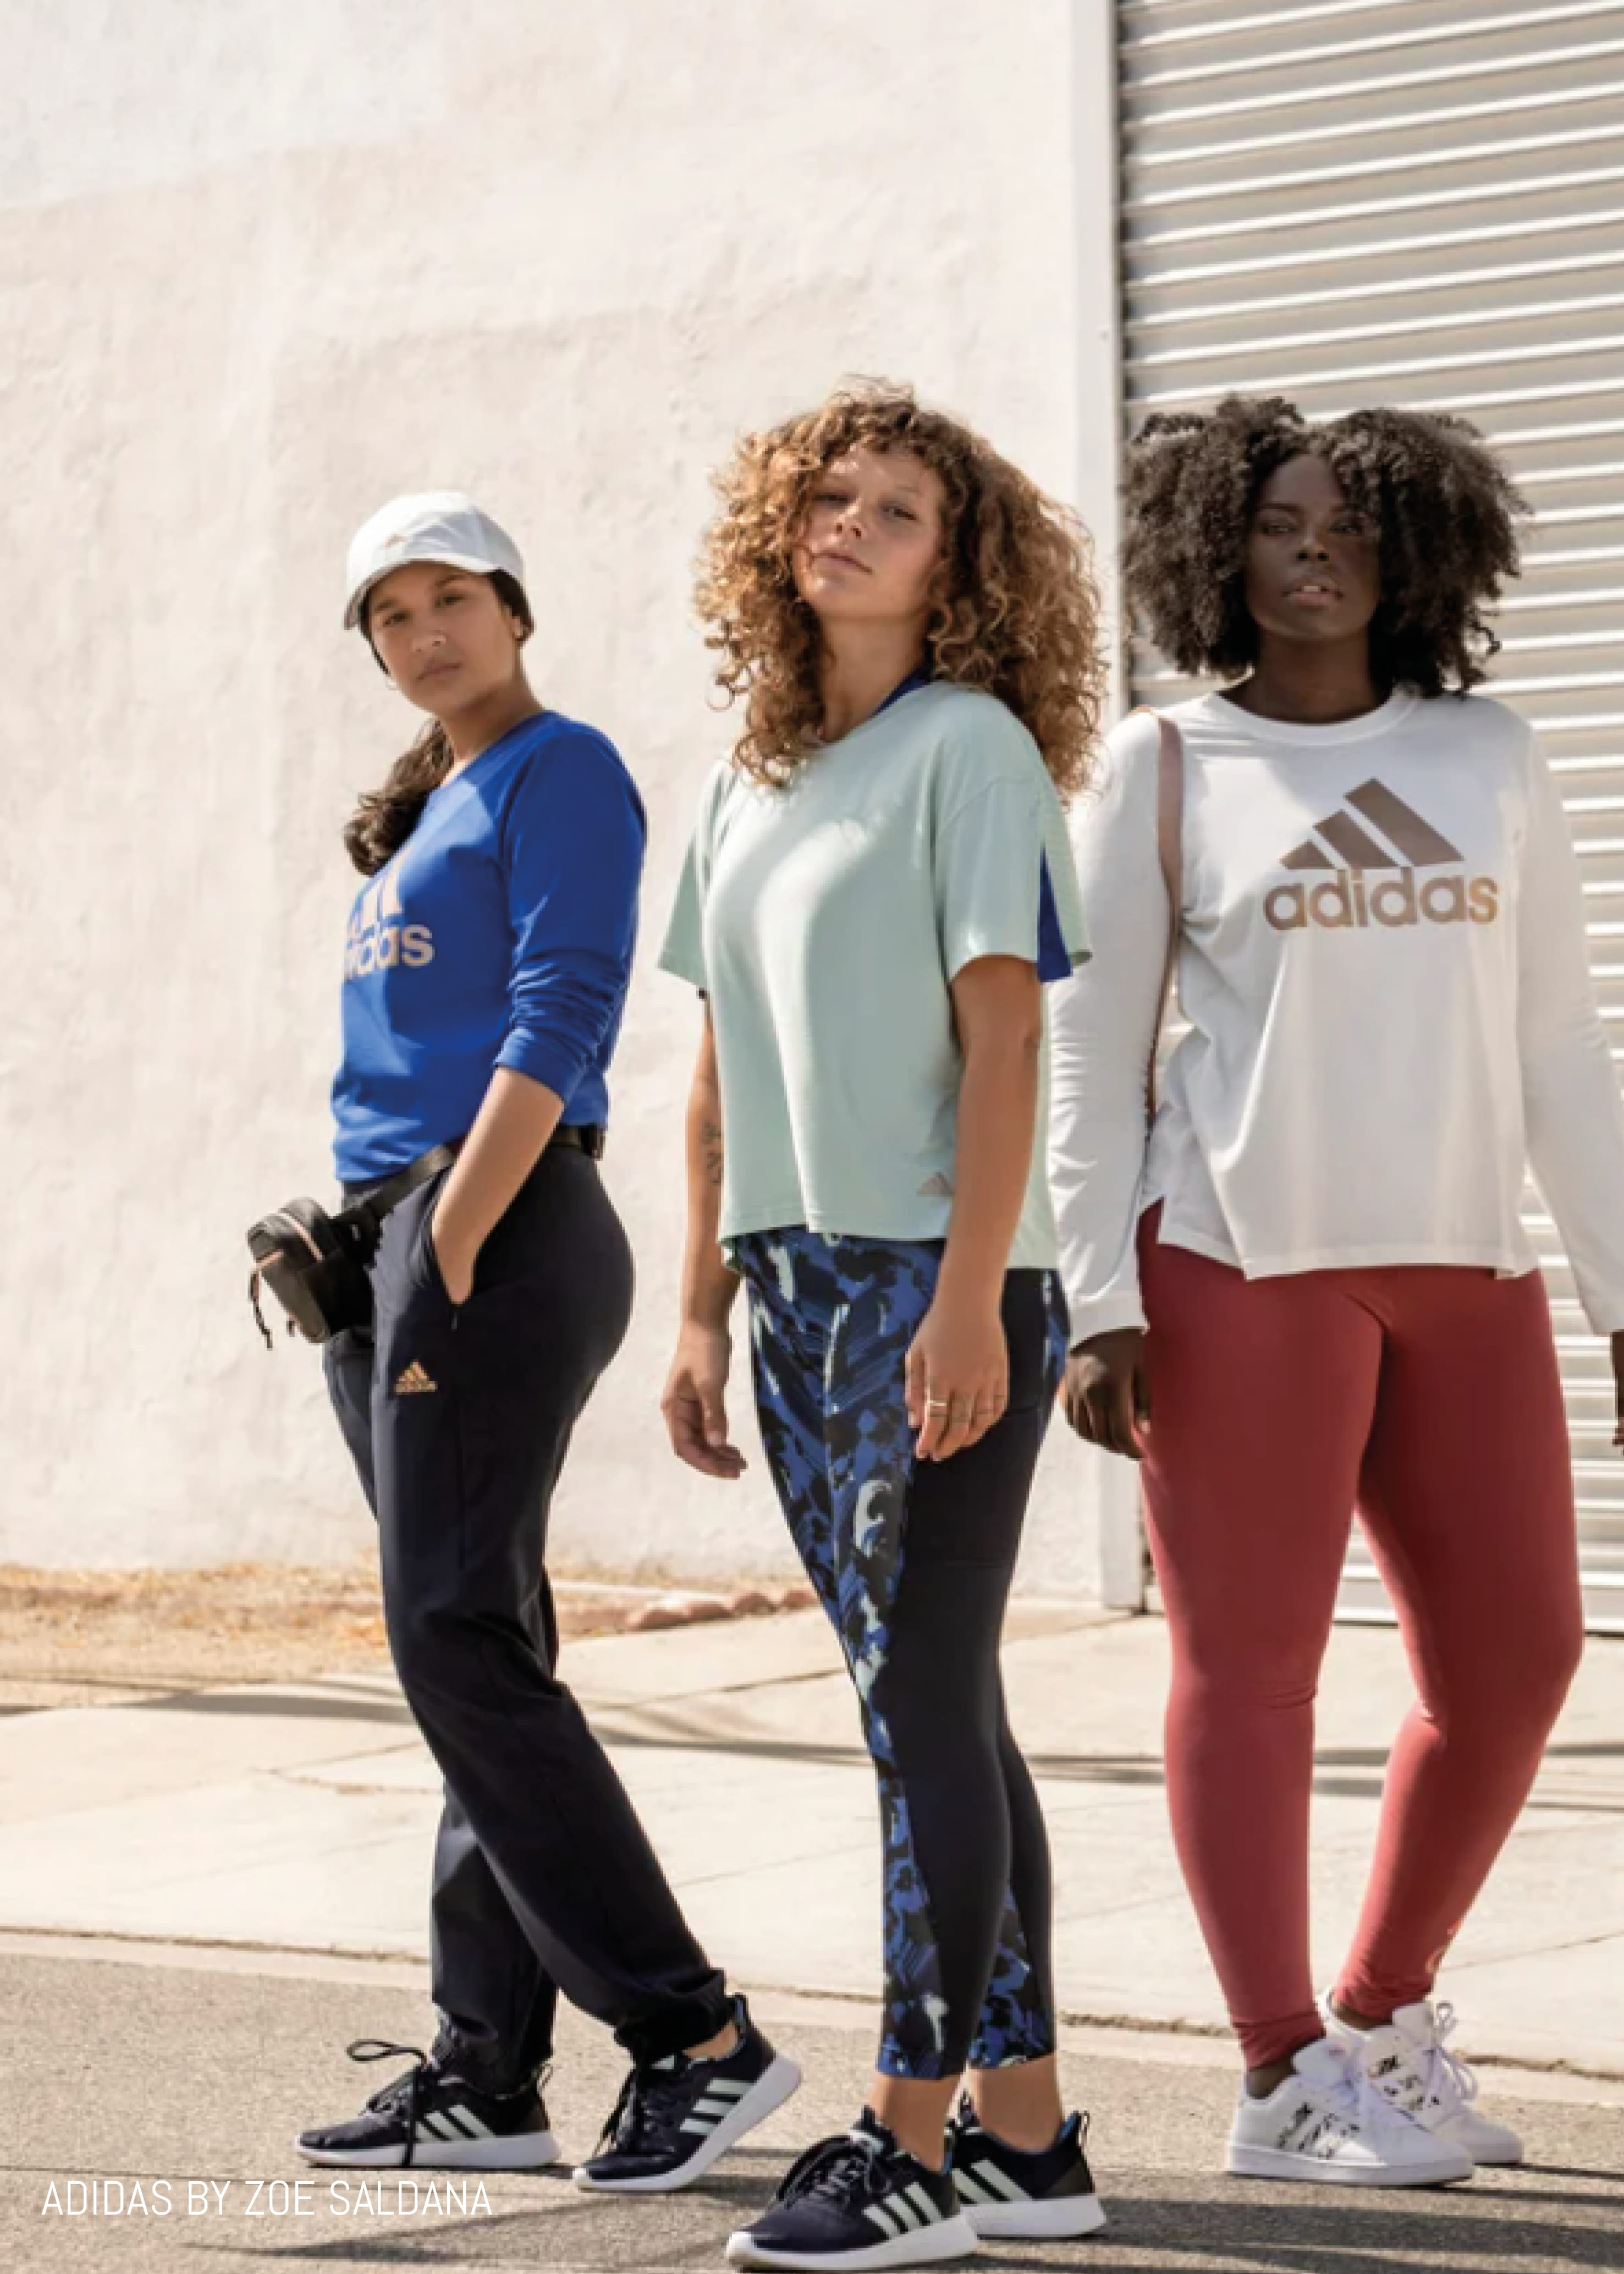 Kohls x Adidas Zoe Saldana Campaign